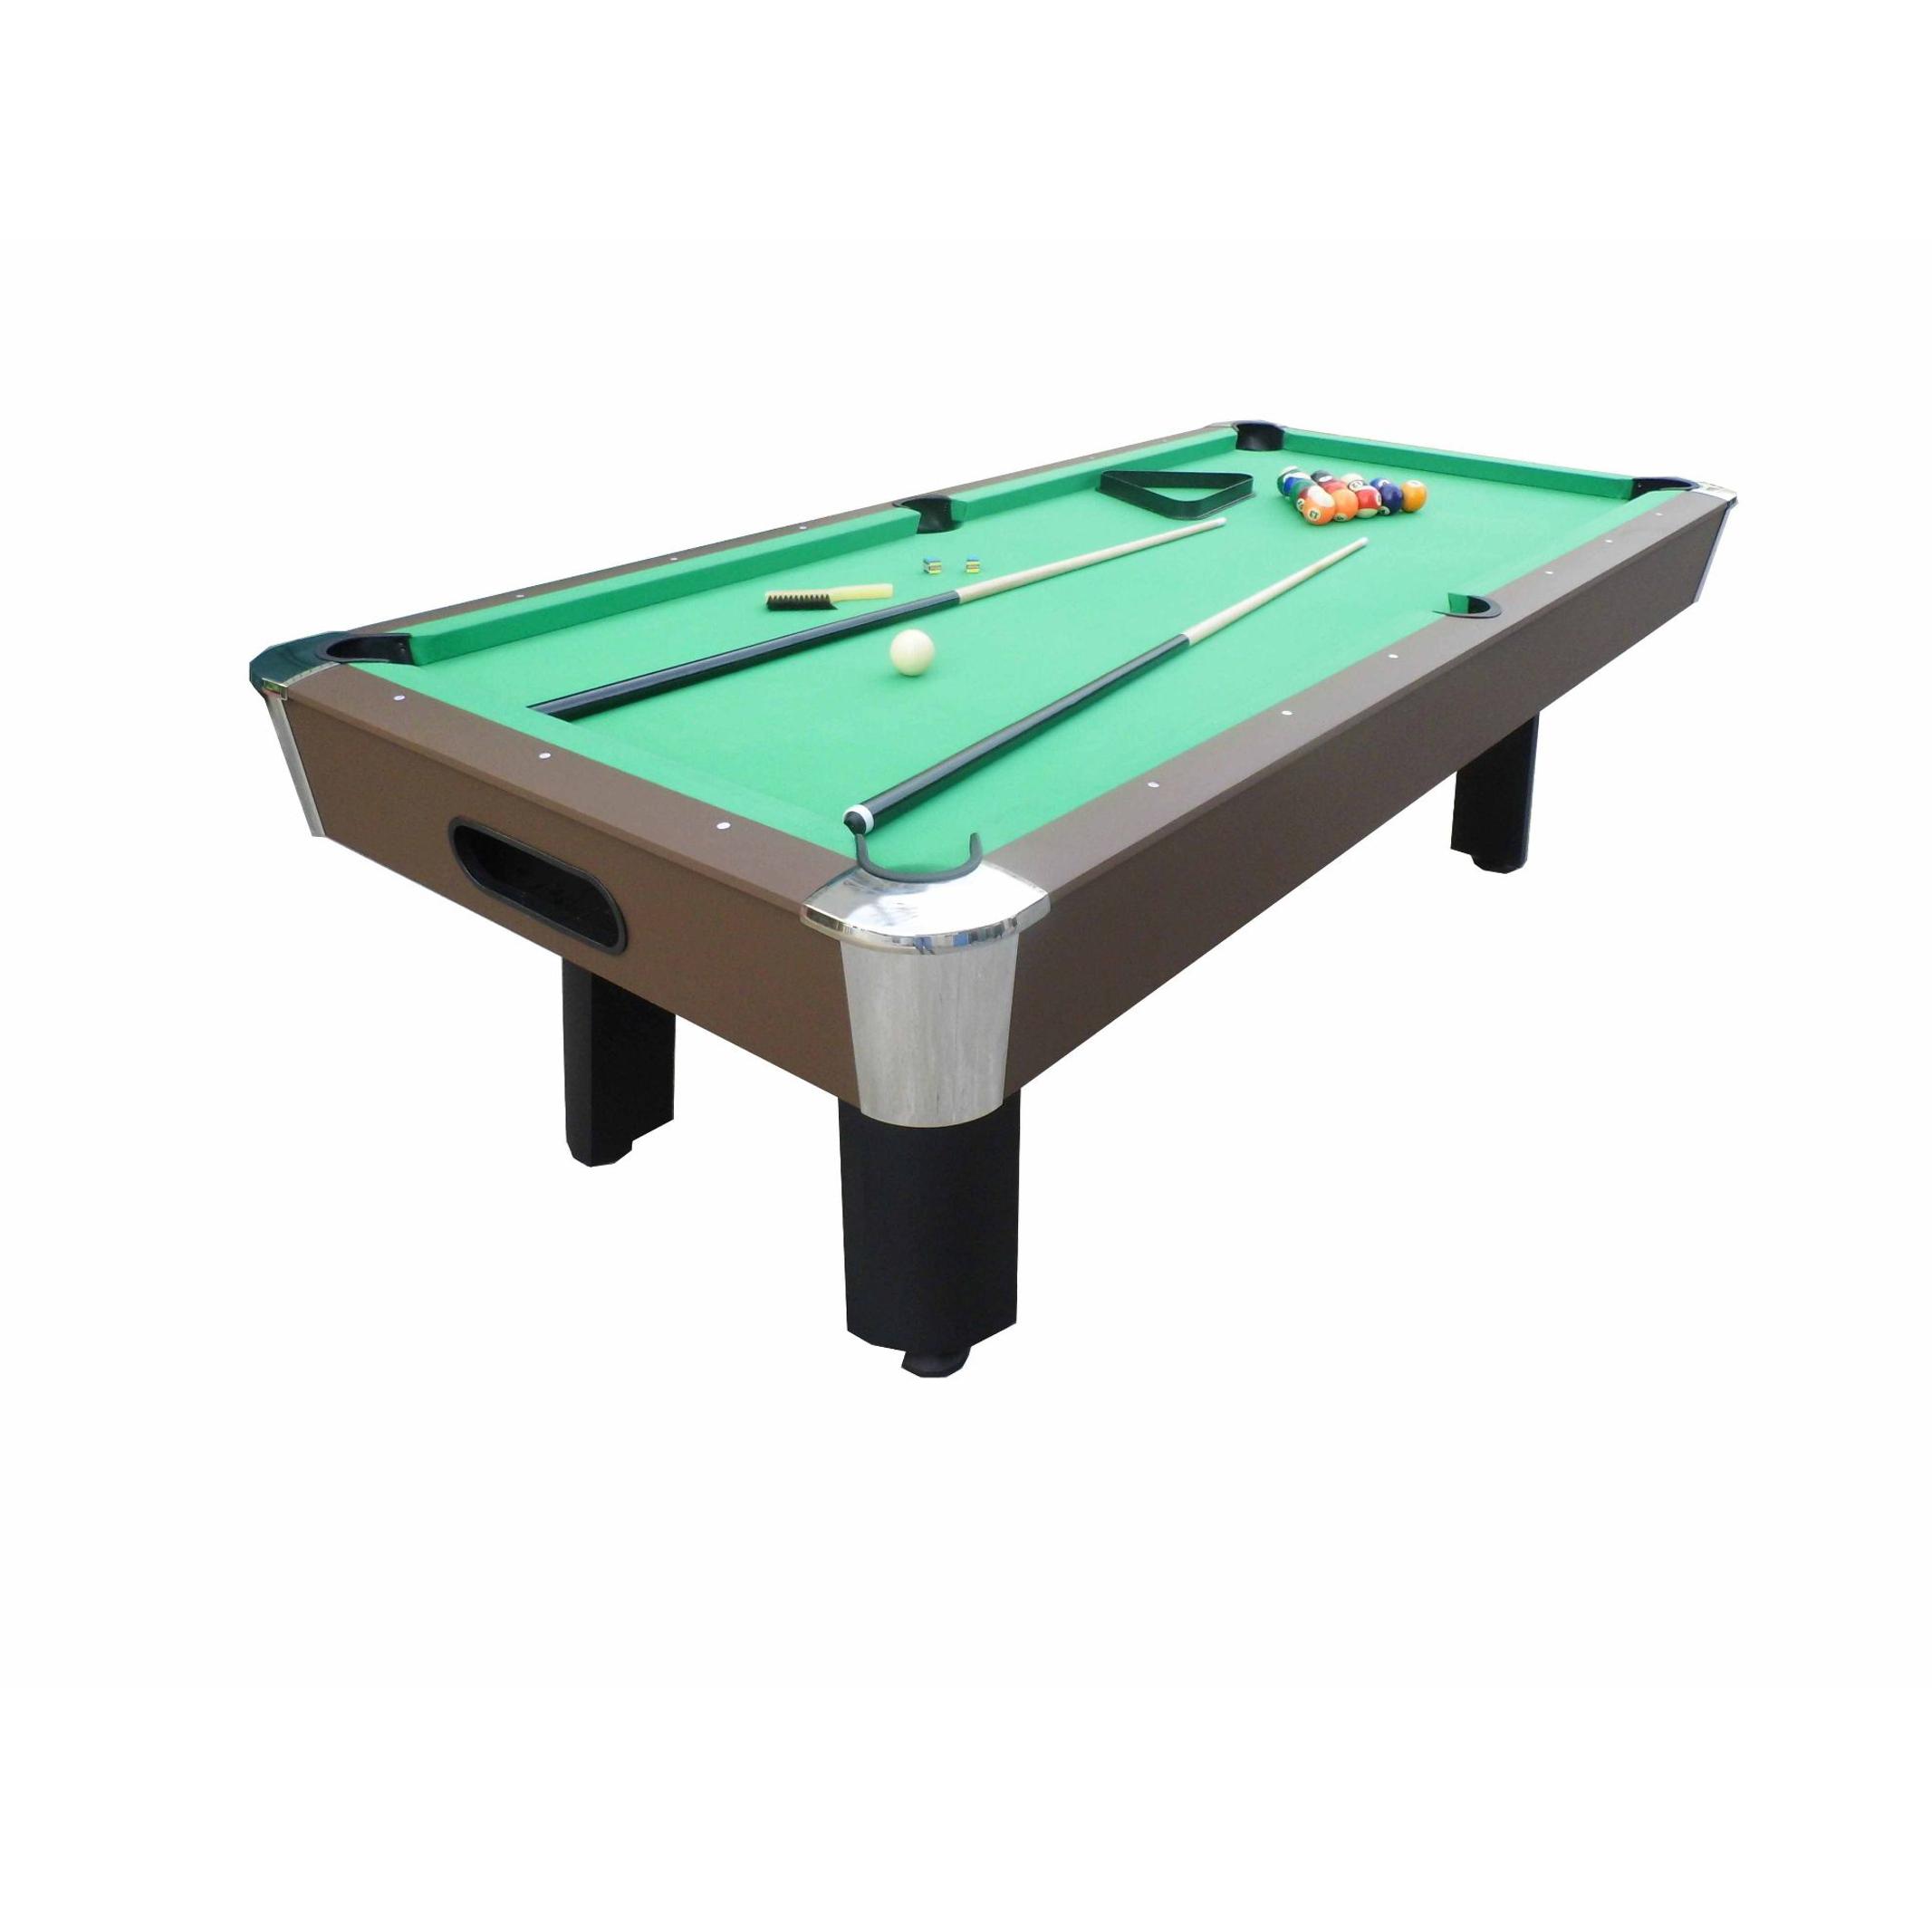 Sportcraft 7 Foot Pool Table